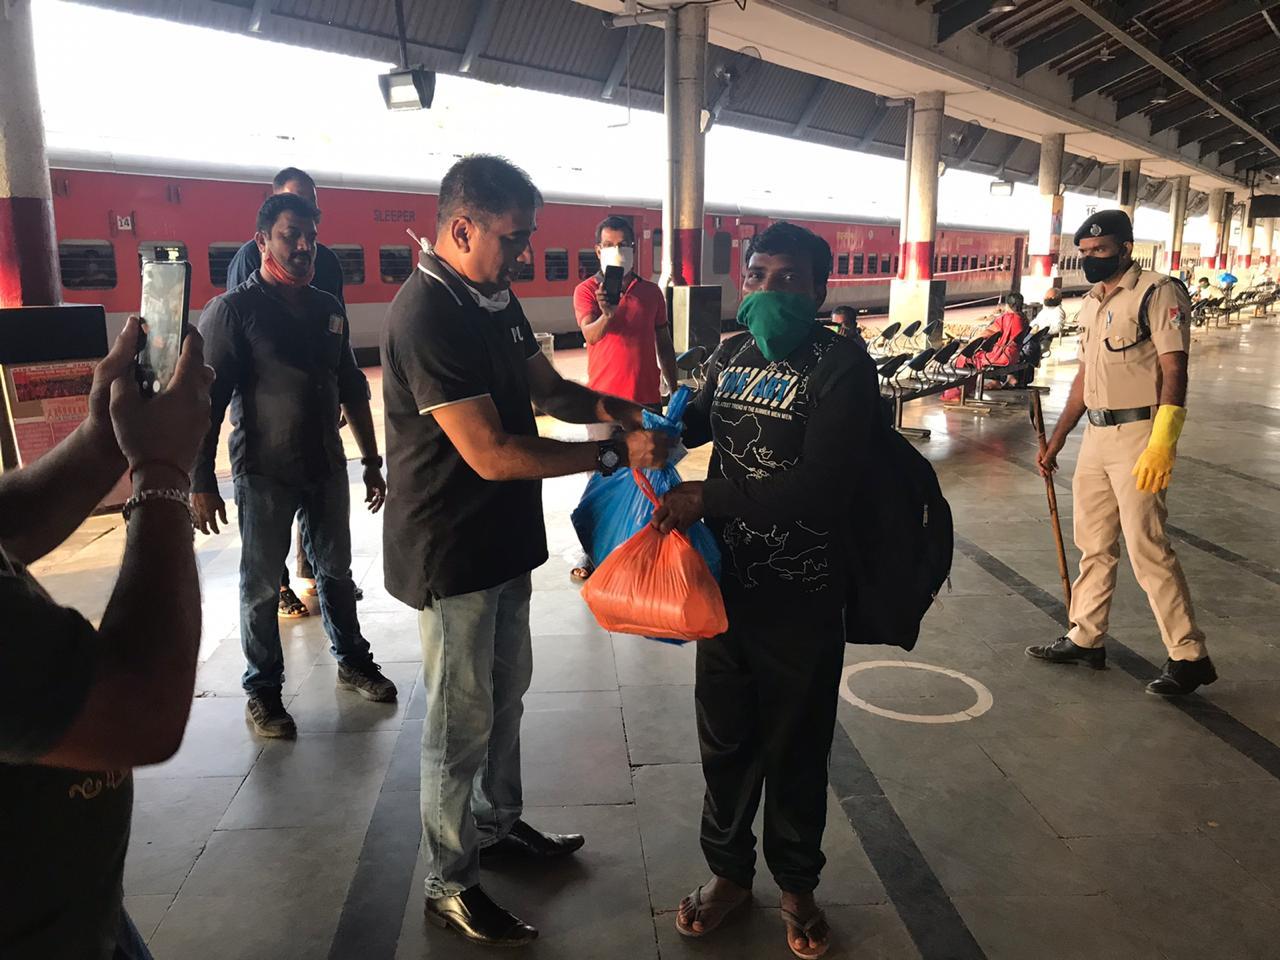 3095 PASSENGERS LEAVES FOR ODISHA AND JHARKHAND